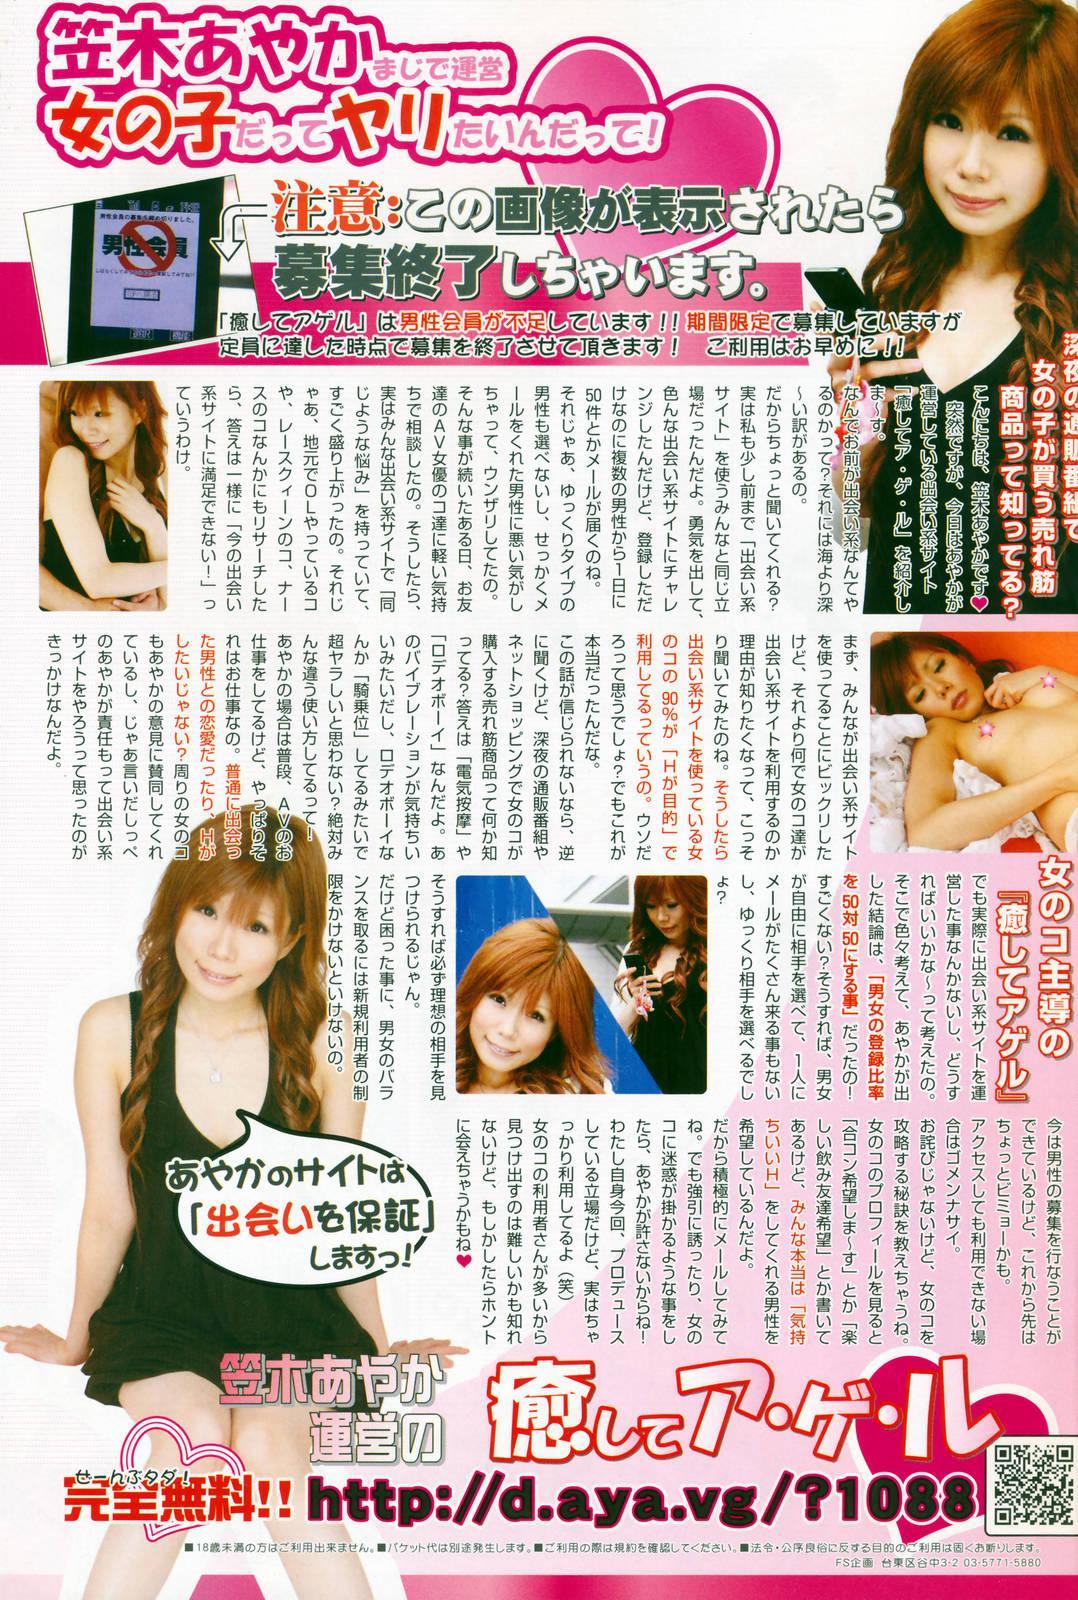 Manga Bangaichi 2009-02 Vol. 234 274